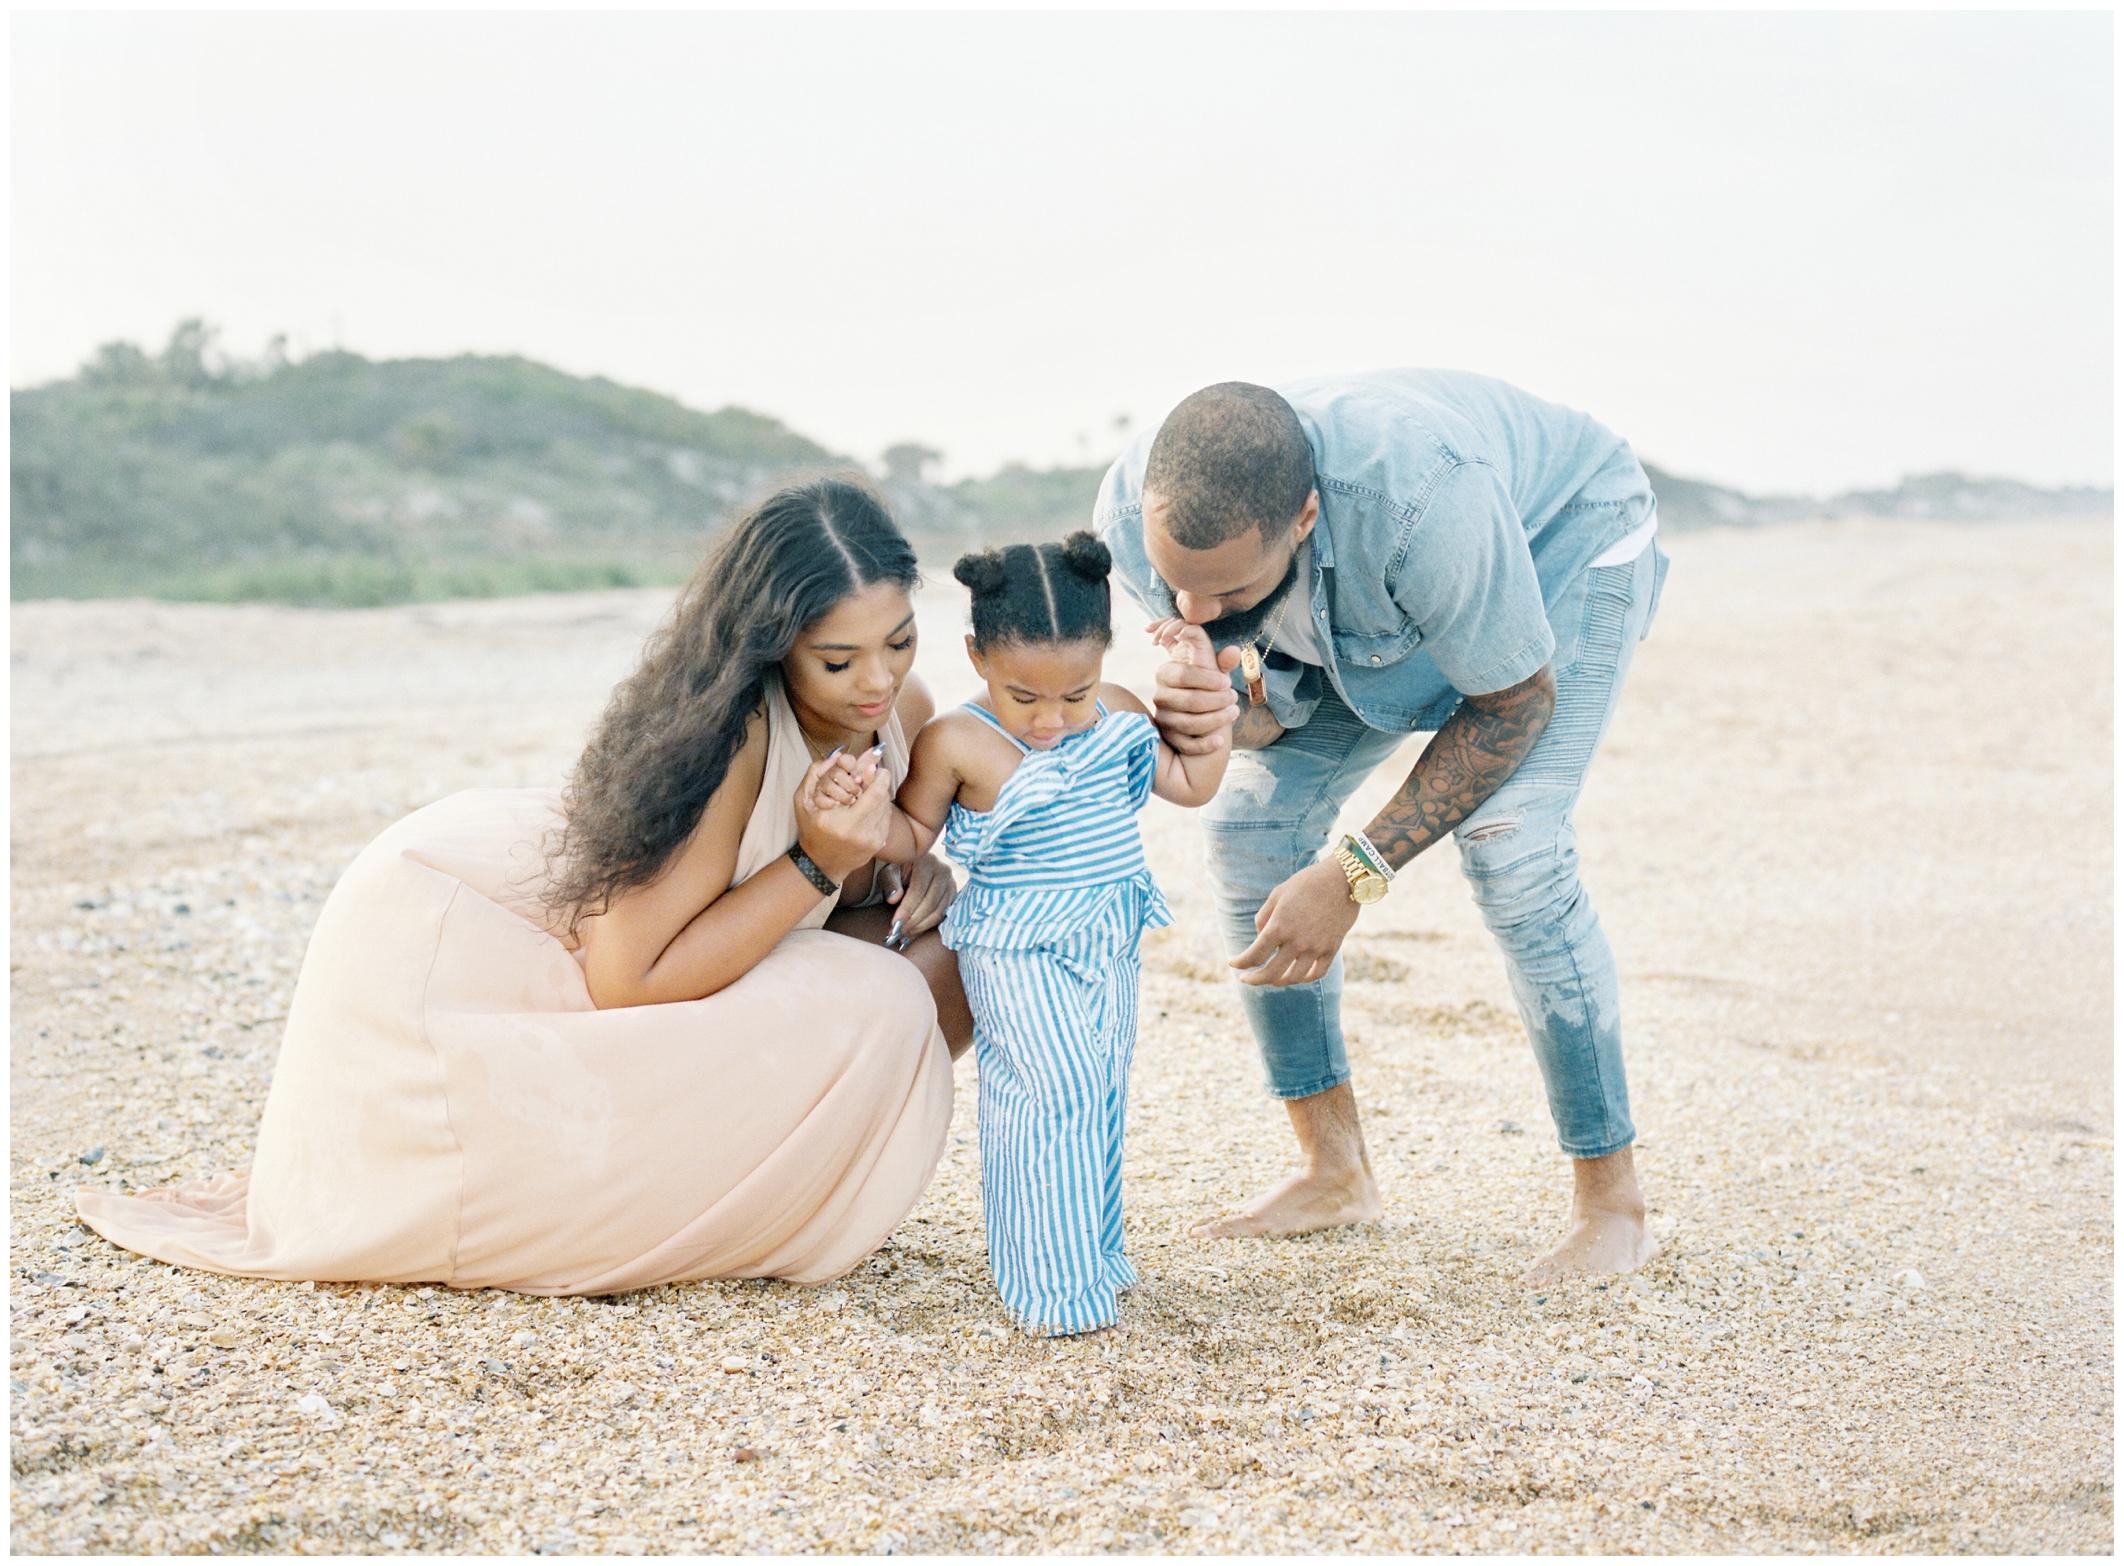 Lisa Silva Photography- Ponte Vedra Beach, St. Augustine and Jacksonville, Florida Fine Art Film Destination Wedding Photography- Family Lifestyle Session at Guana Preserve_0040.jpg